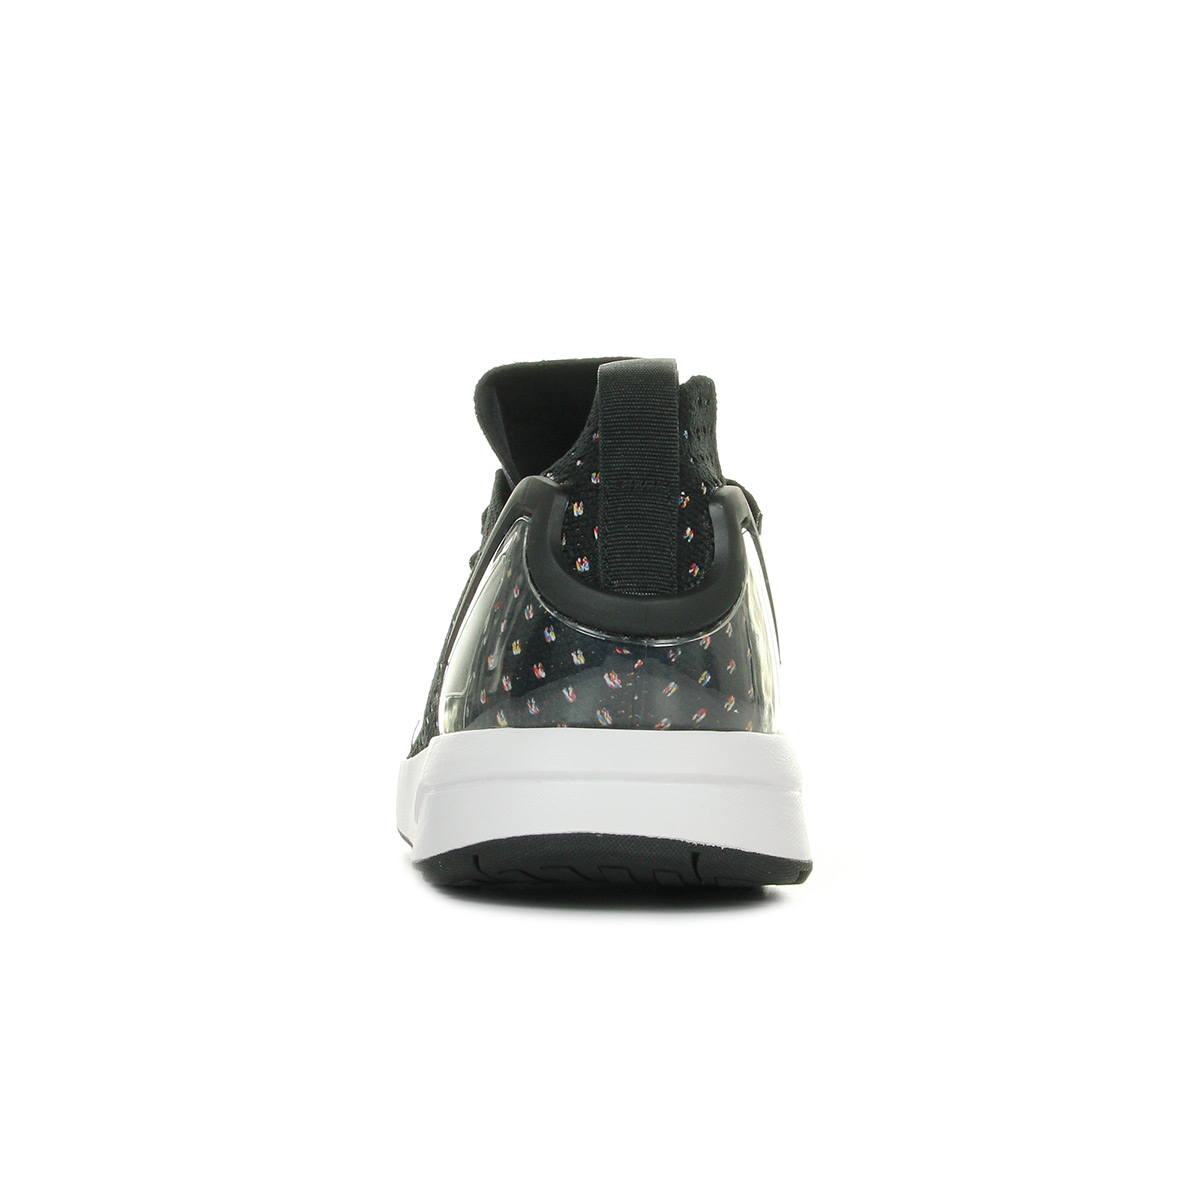 adidas ZX Flux Adv Asymetrical Primeknit S76368, Baskets mode homme